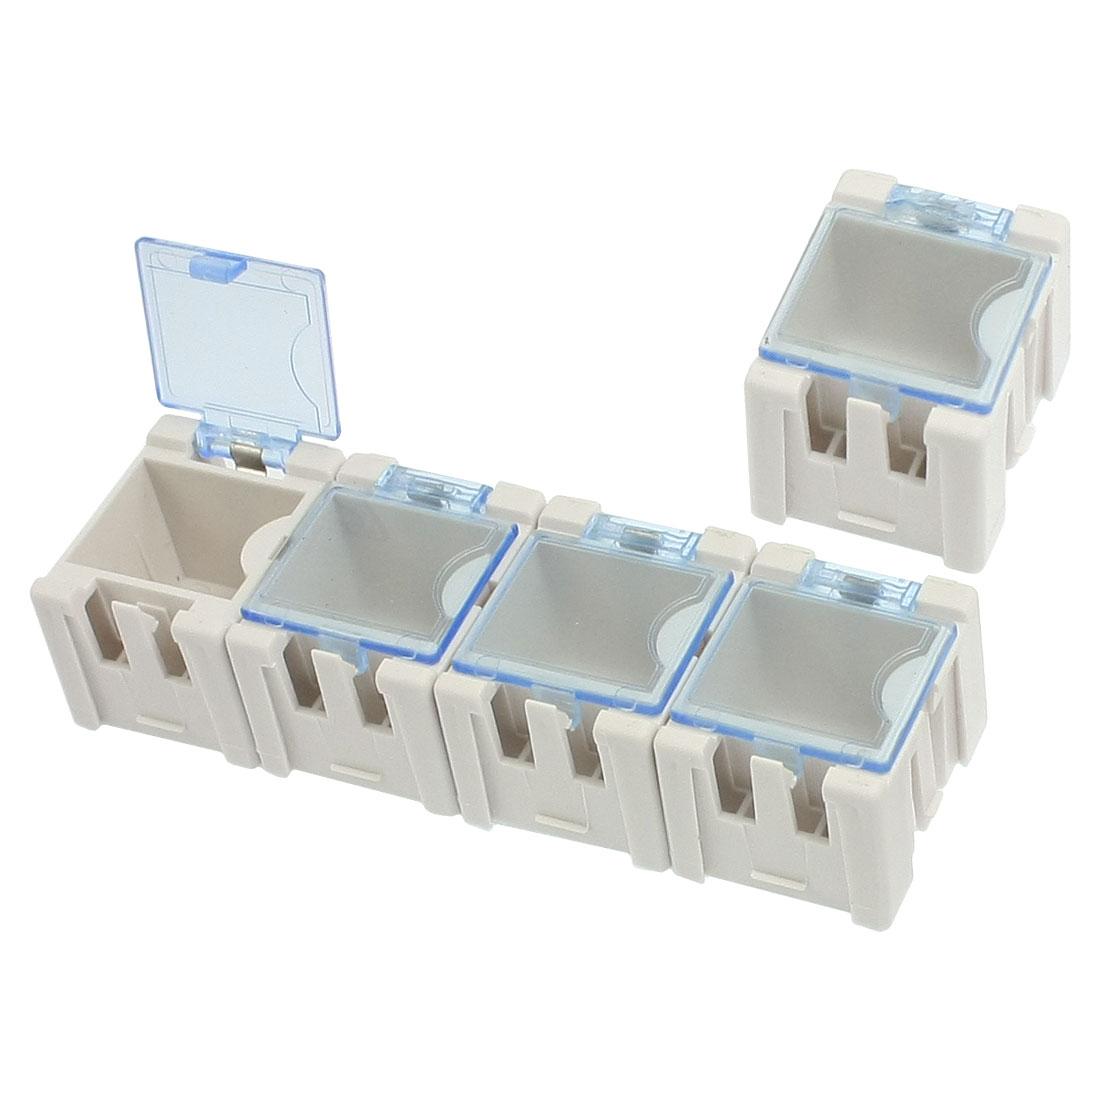 Plastic Components Electronics Storage Box Case White